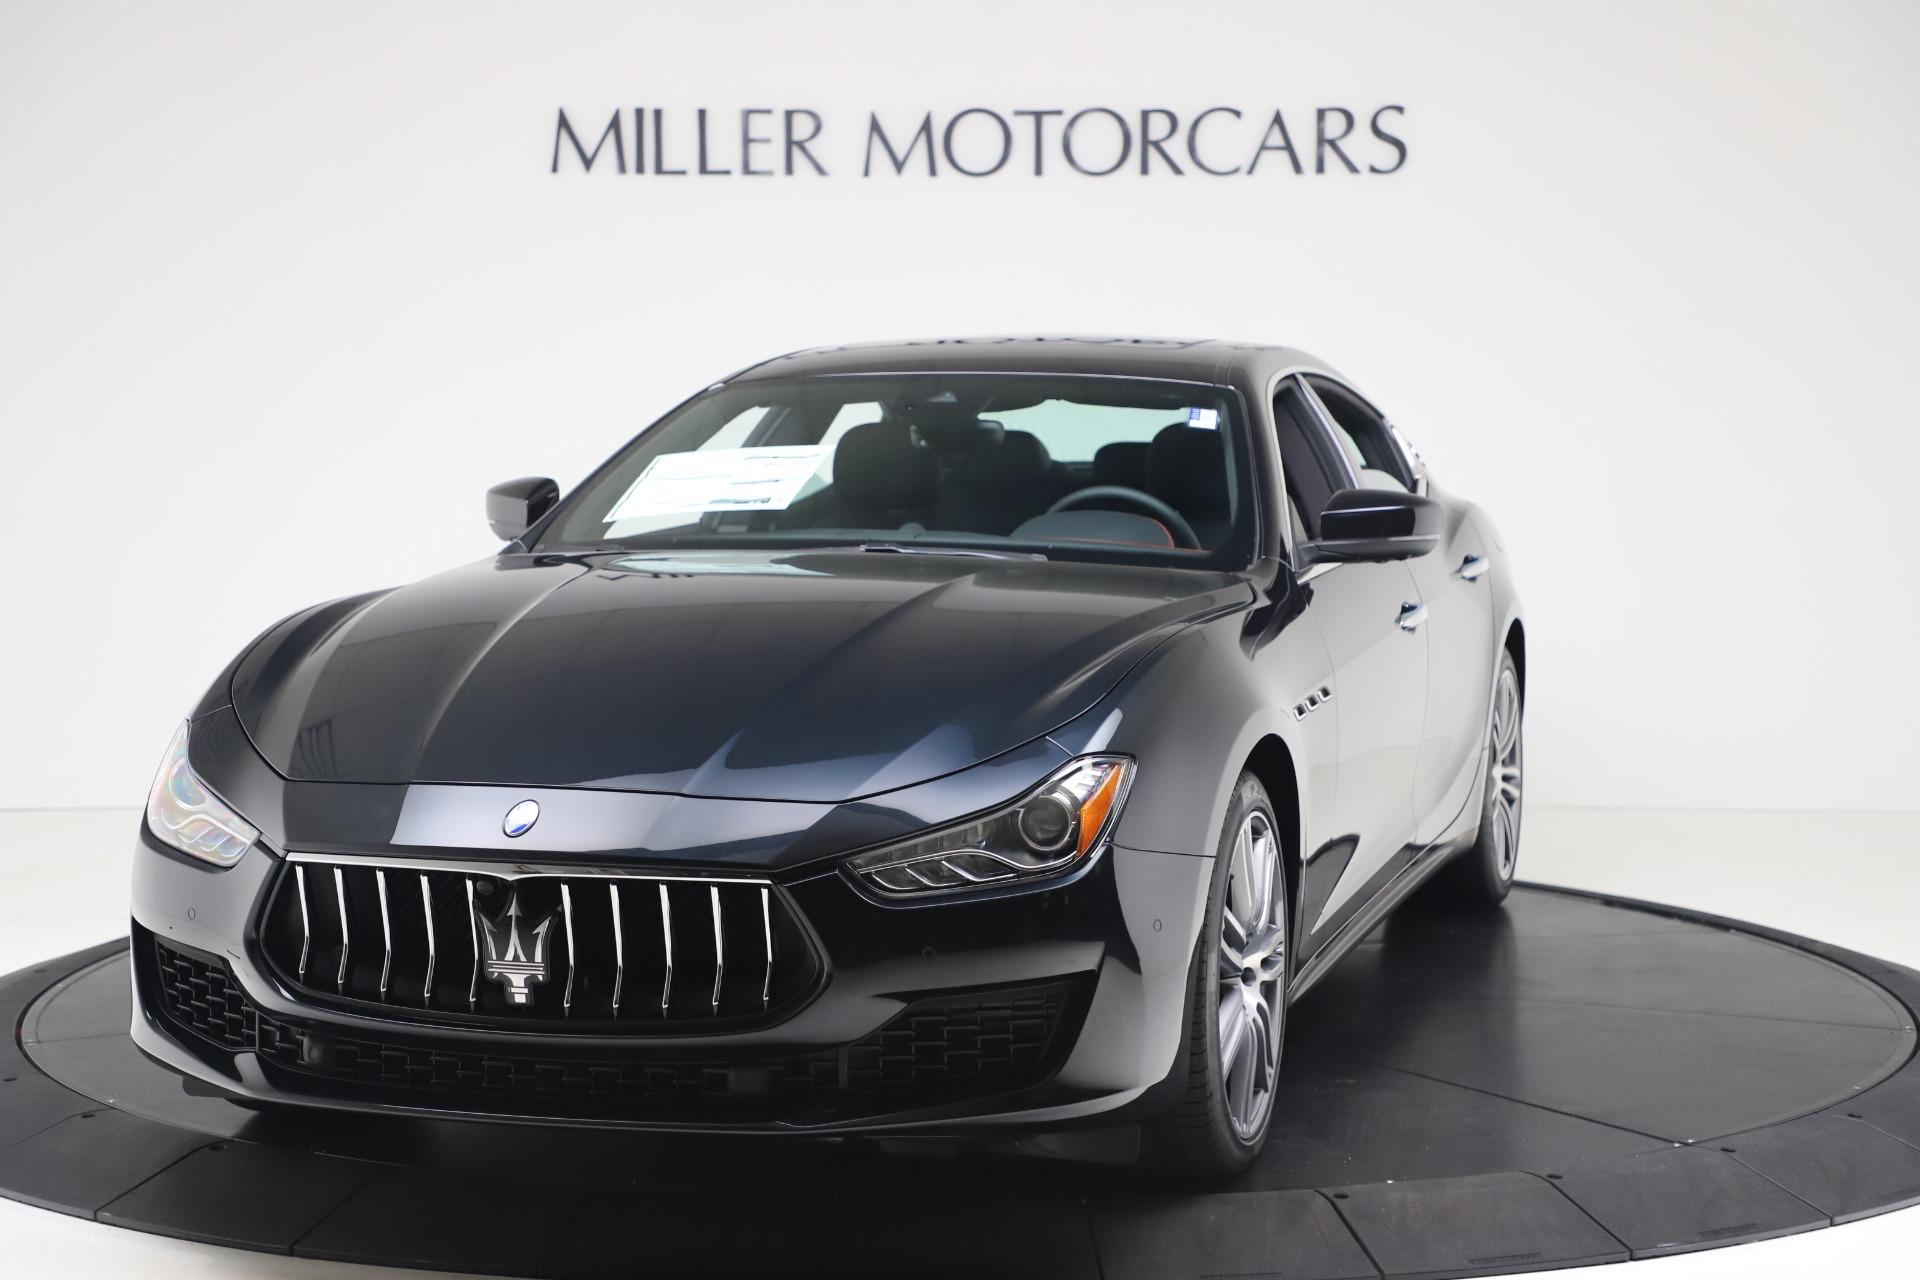 New 2020 Maserati Ghibli S Q4 for sale $87,285 at Alfa Romeo of Greenwich in Greenwich CT 06830 1